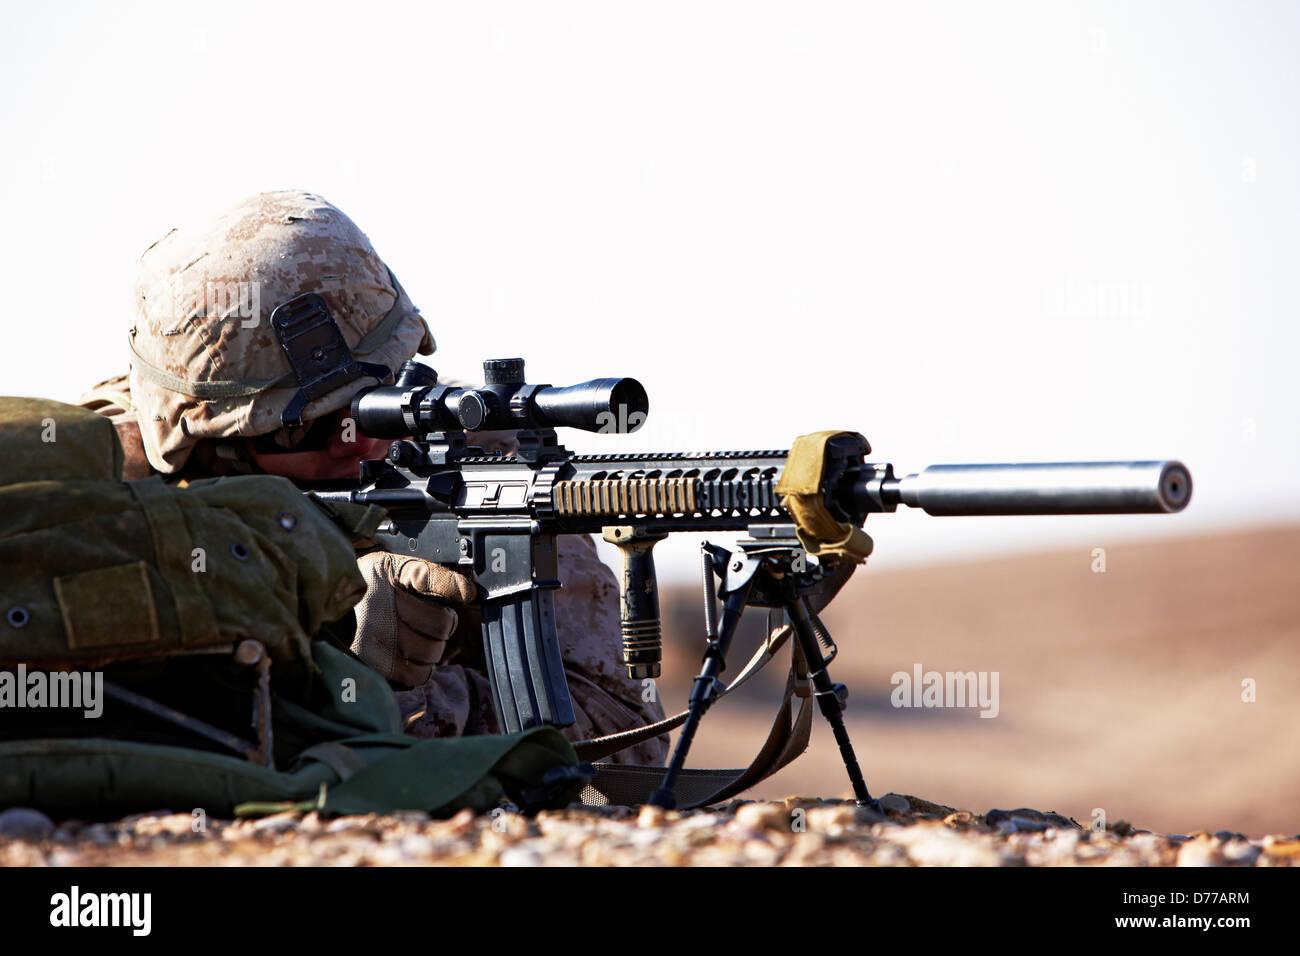 A U.S Marine Designated Marksman Peers Through Scope High Power Rifle Suppressor Mounted During Combat Operation - Stock Image